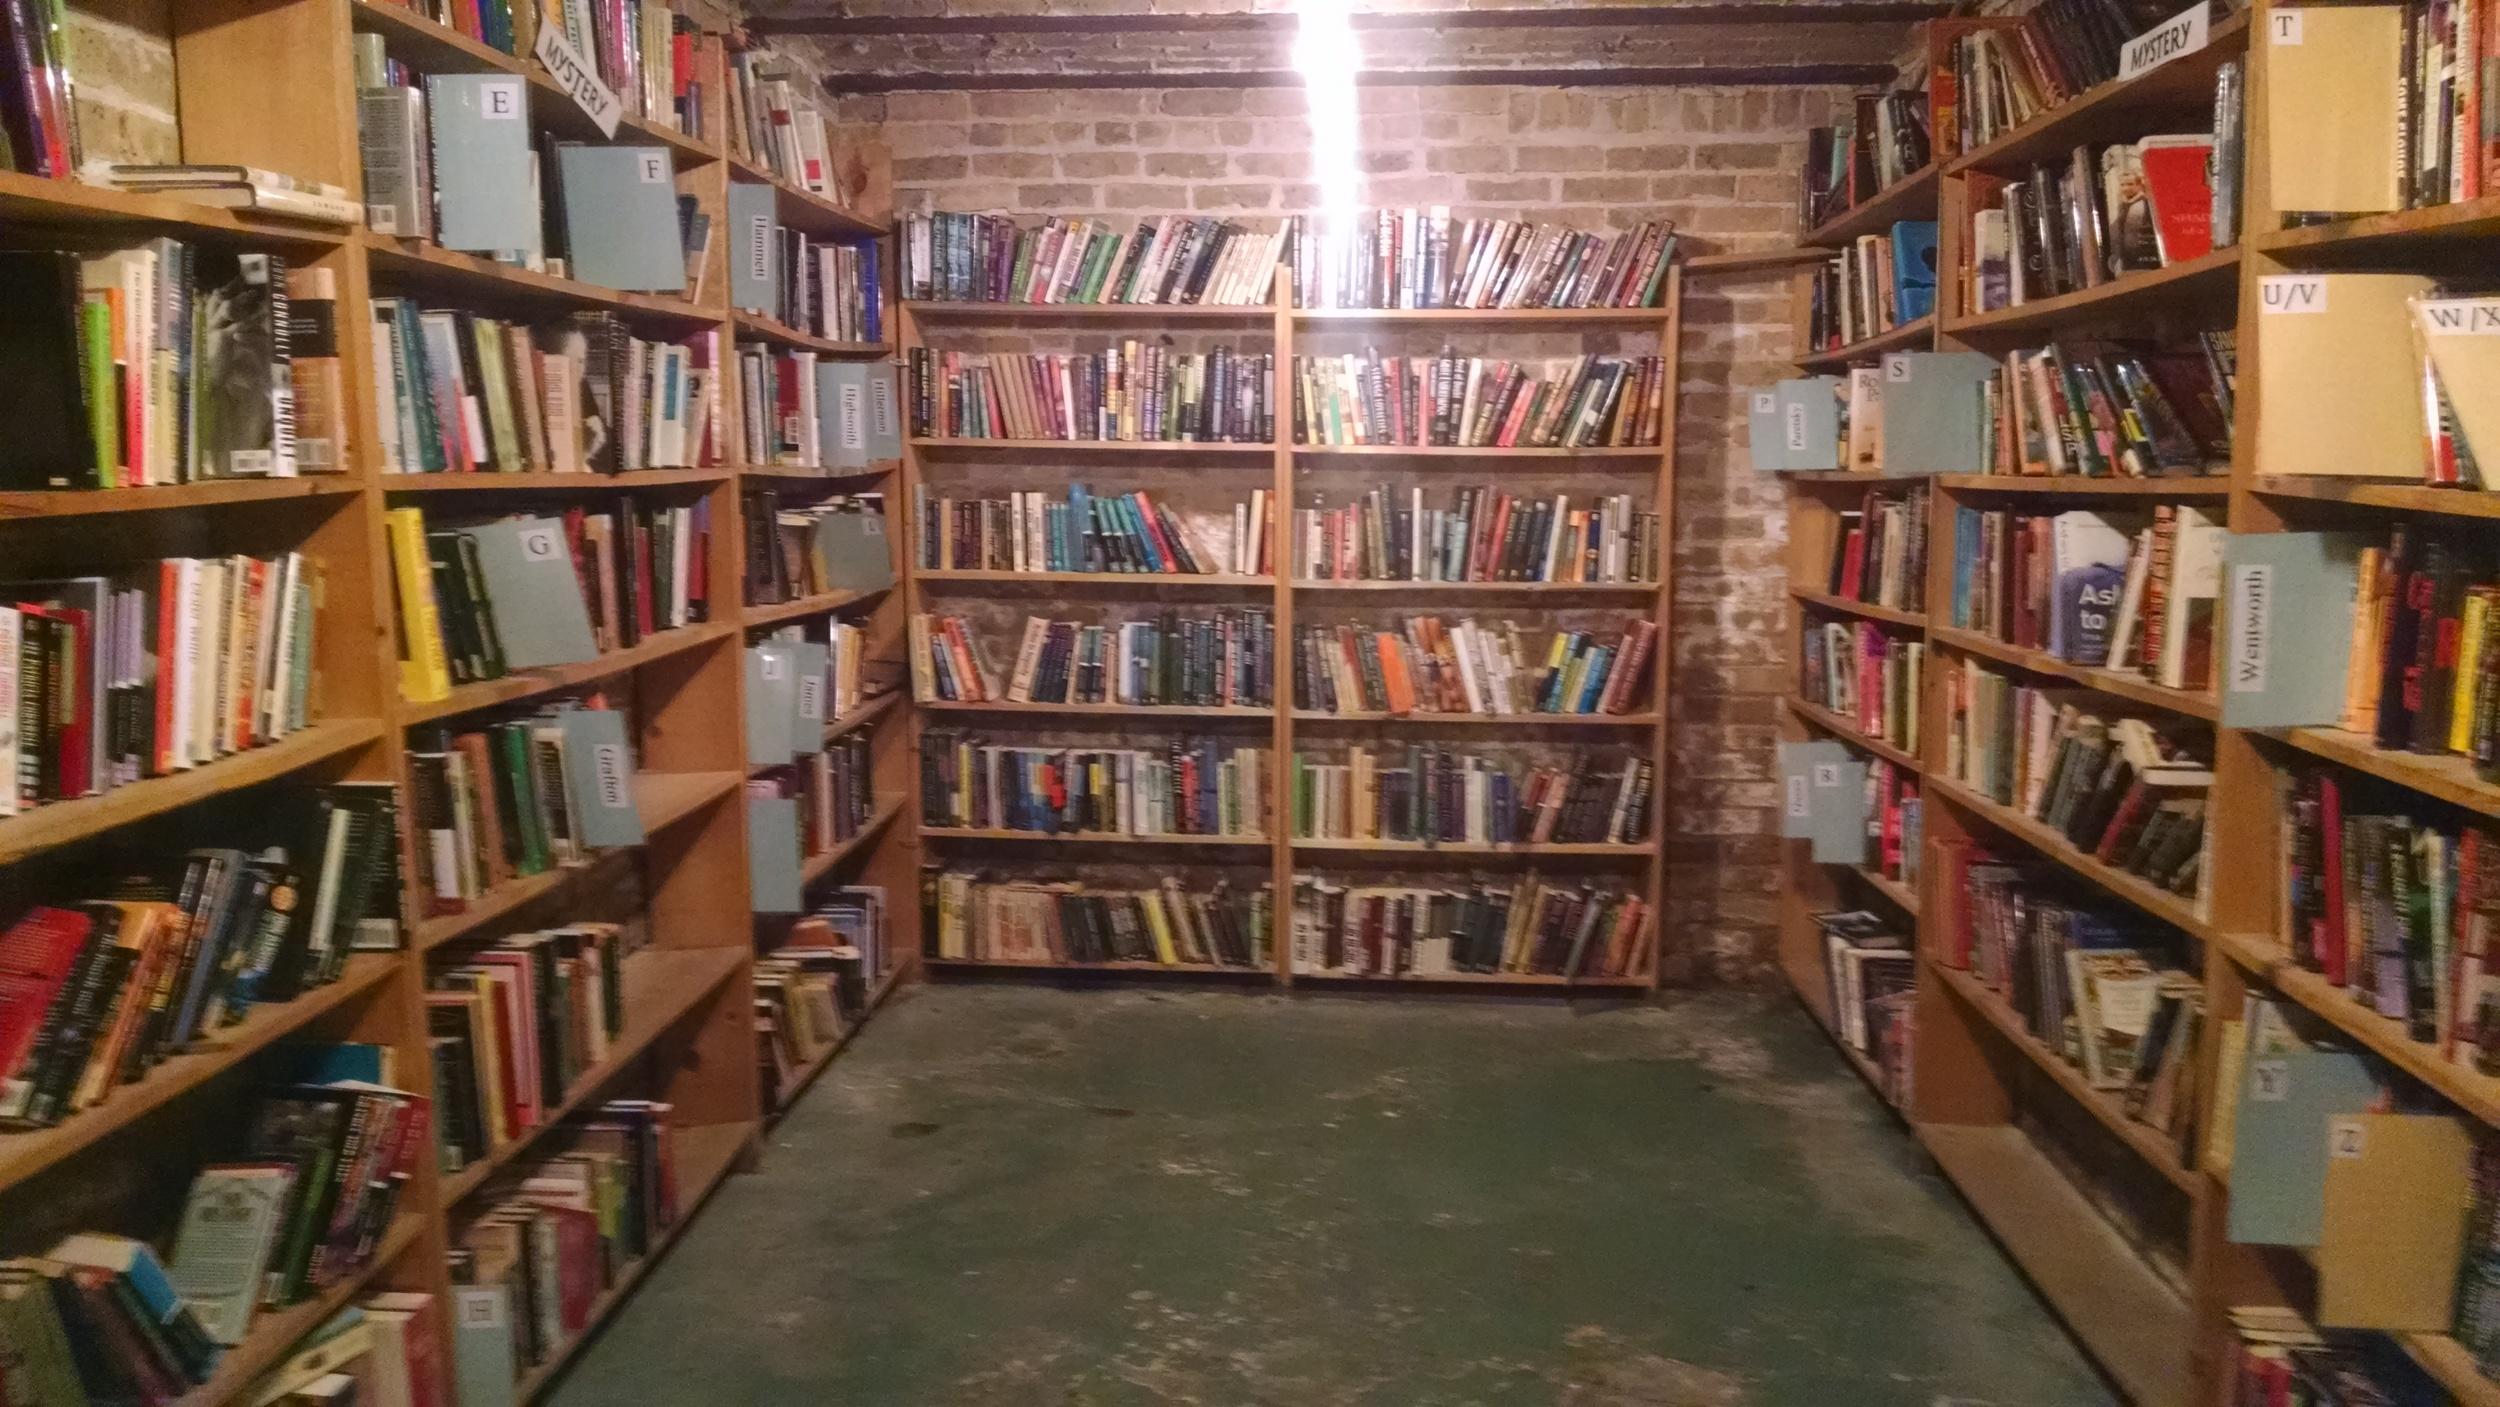 Abandon hope, all who enter the basement. Not really, but it's a BASEMENT.